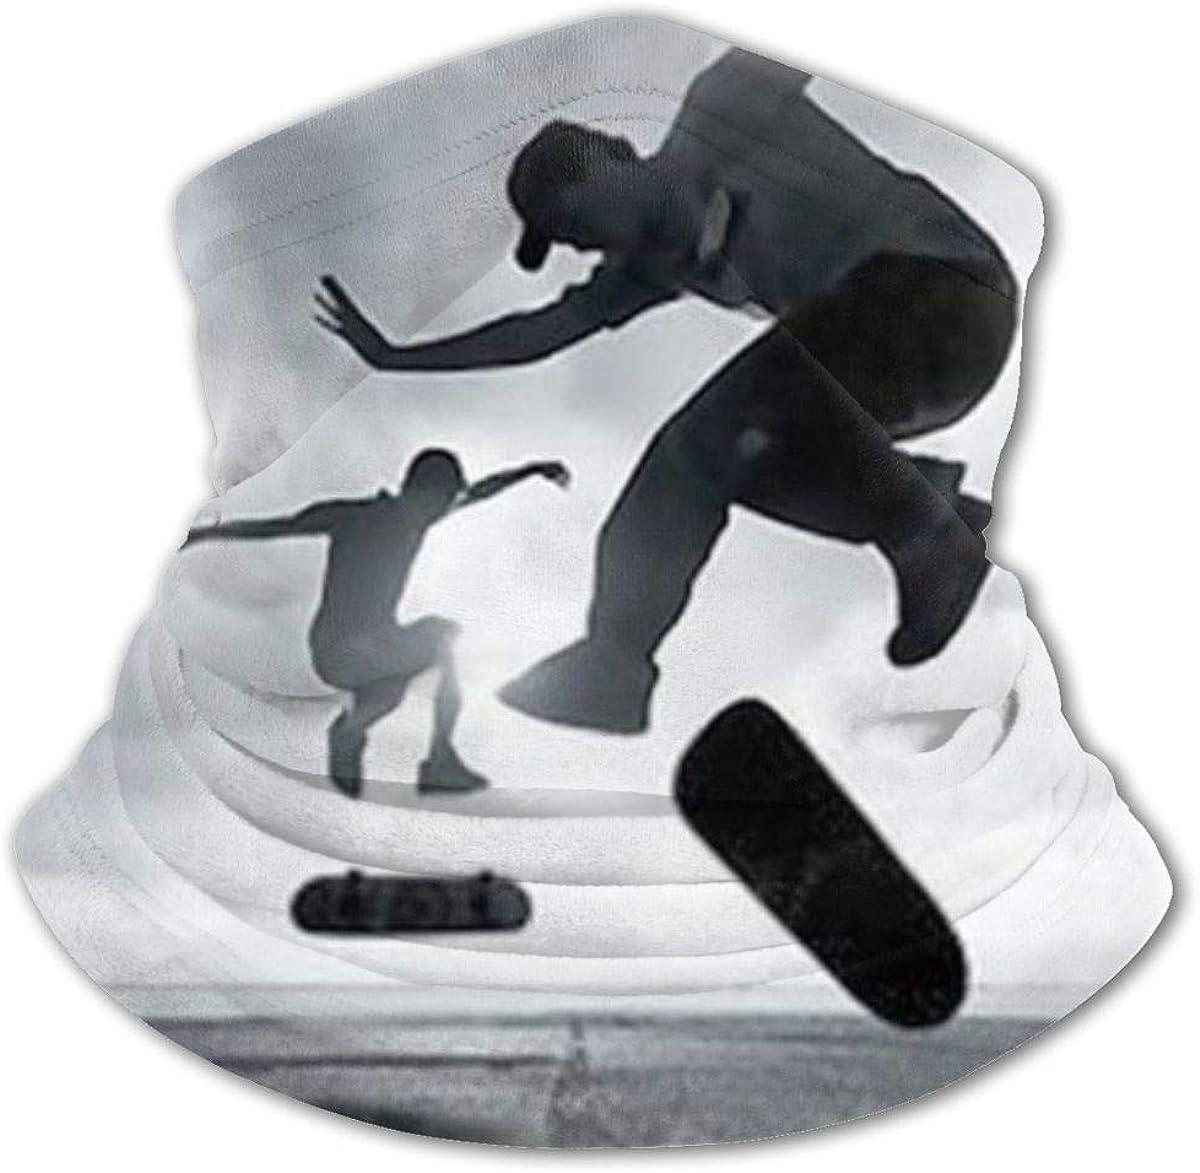 Skateboard Headwear For Girls And Boys, Head Wrap, Neck Gaiter, Headband, Tenn Fishing Mask, Magic Scarf, Tube Mask, Face Bandana Mask For Camping Running Cycling